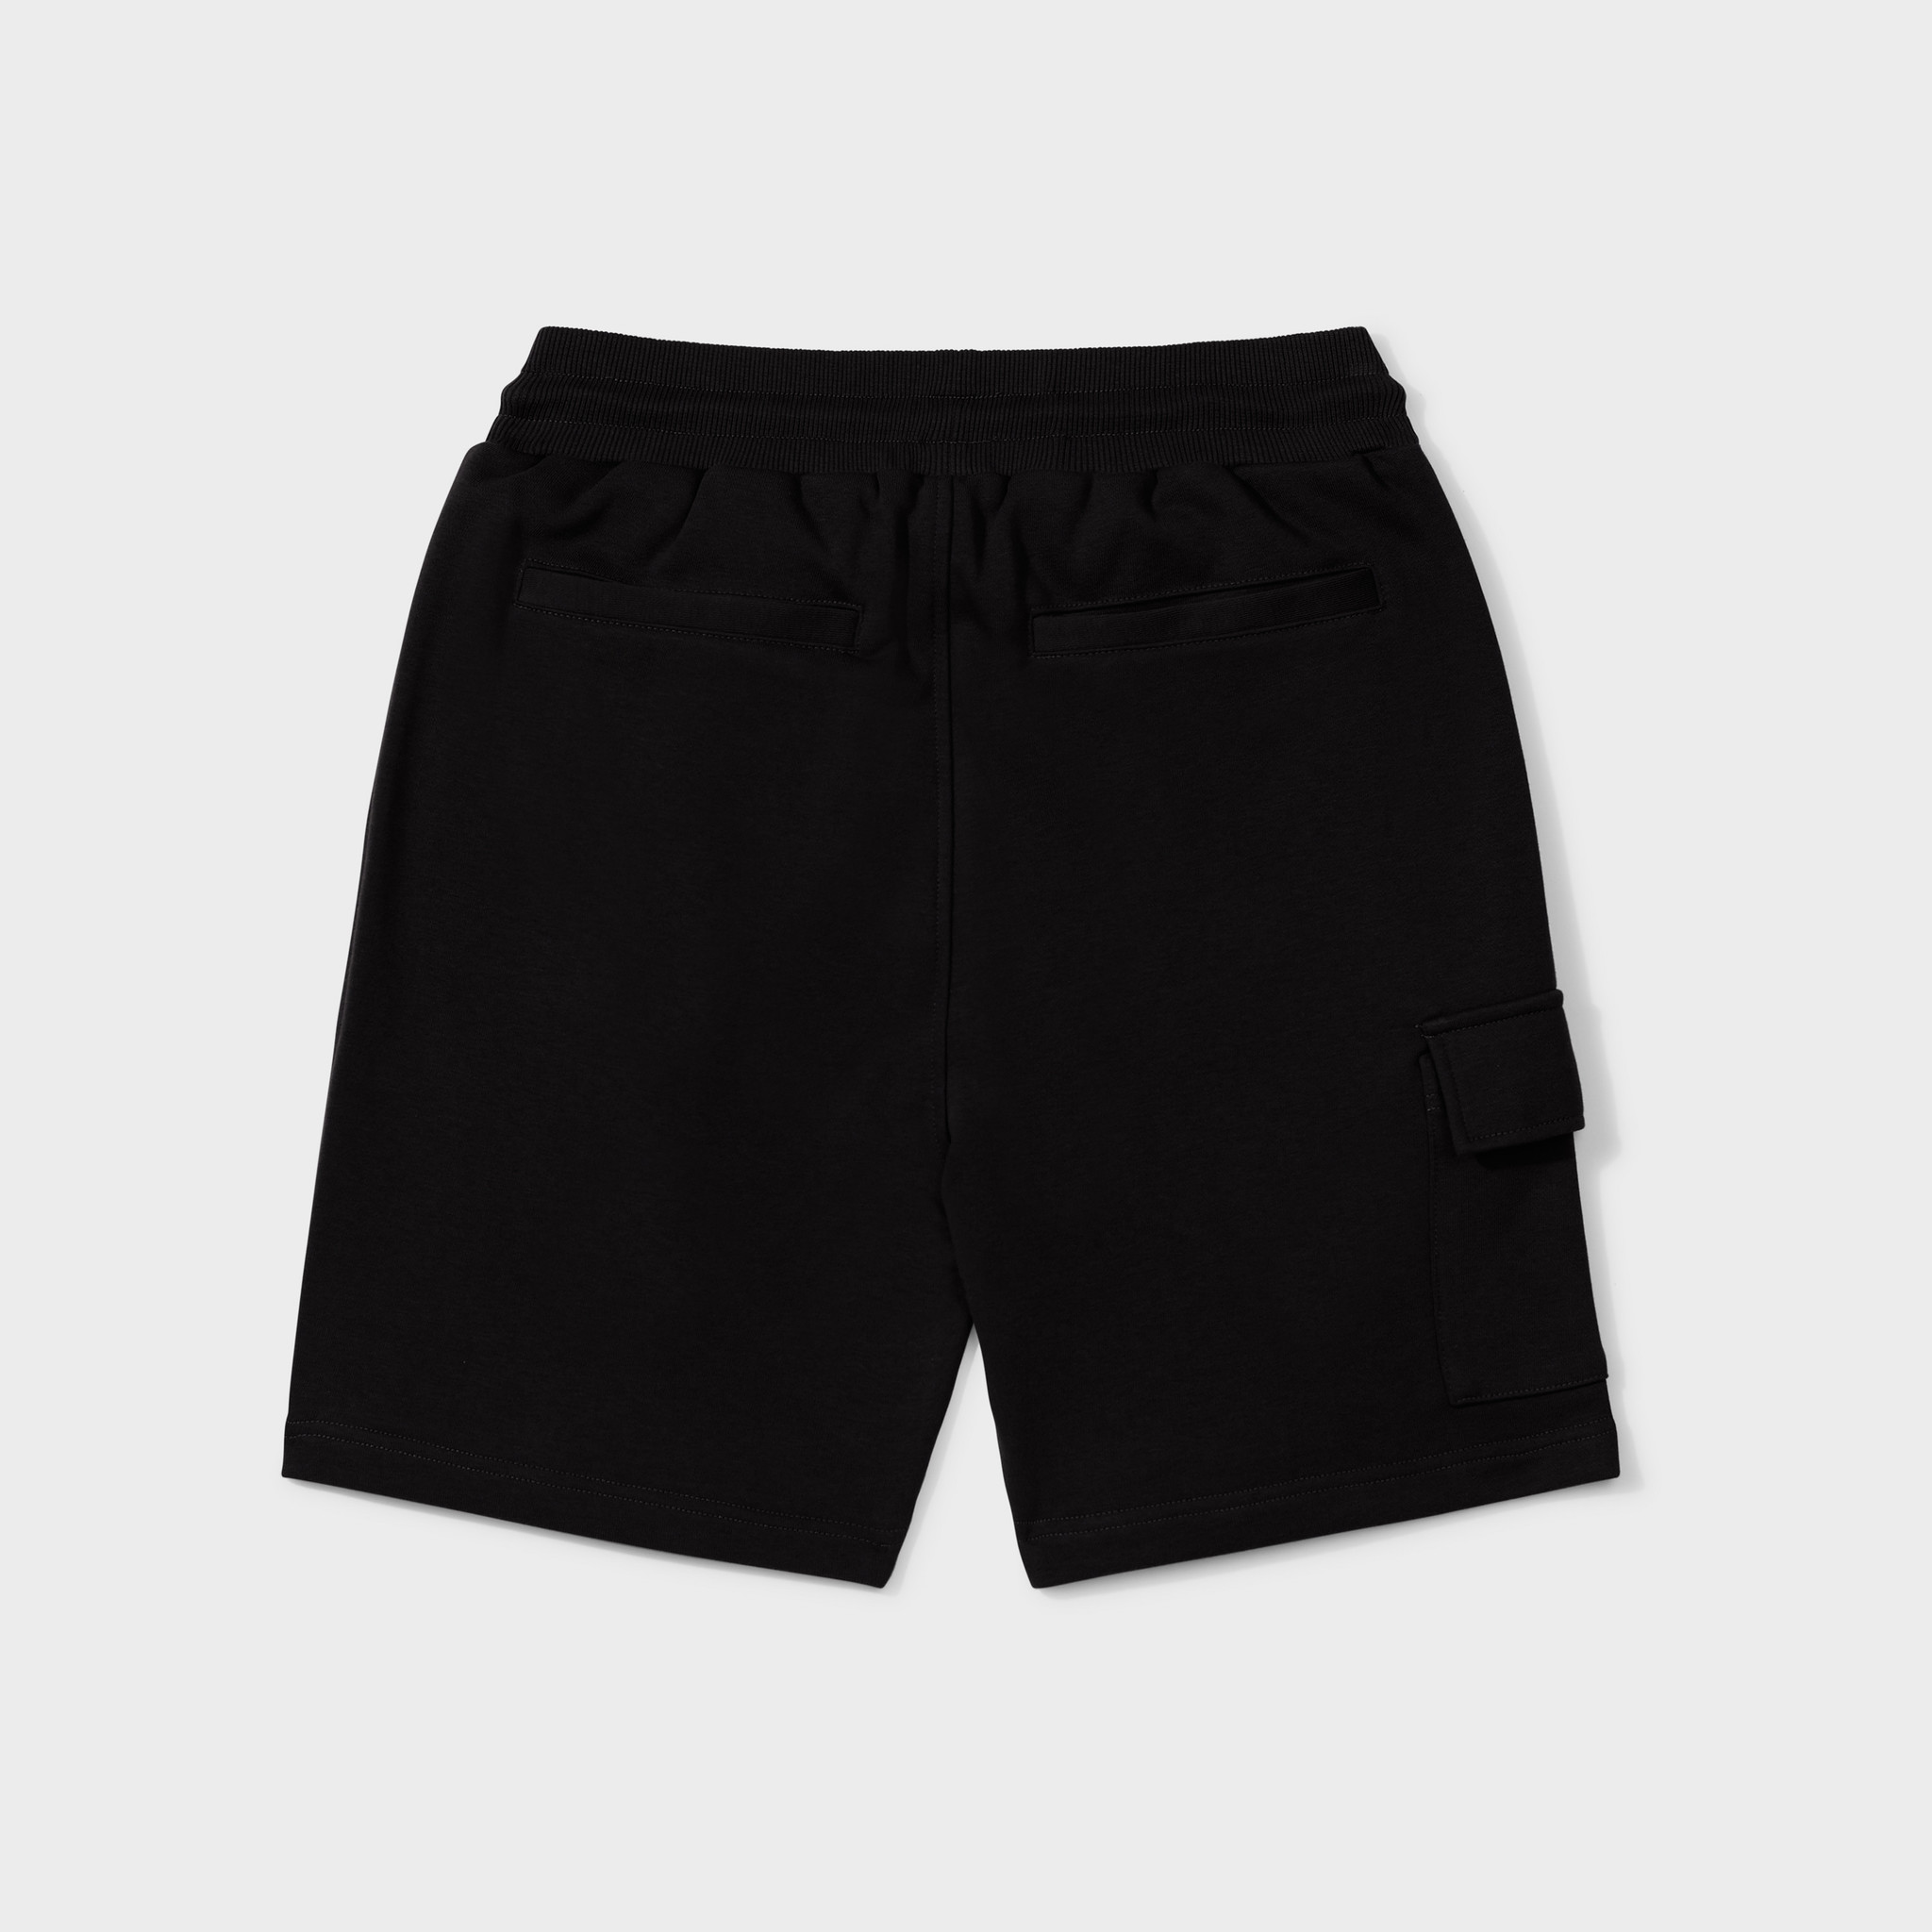 Wafi signature shorts black & antra-2